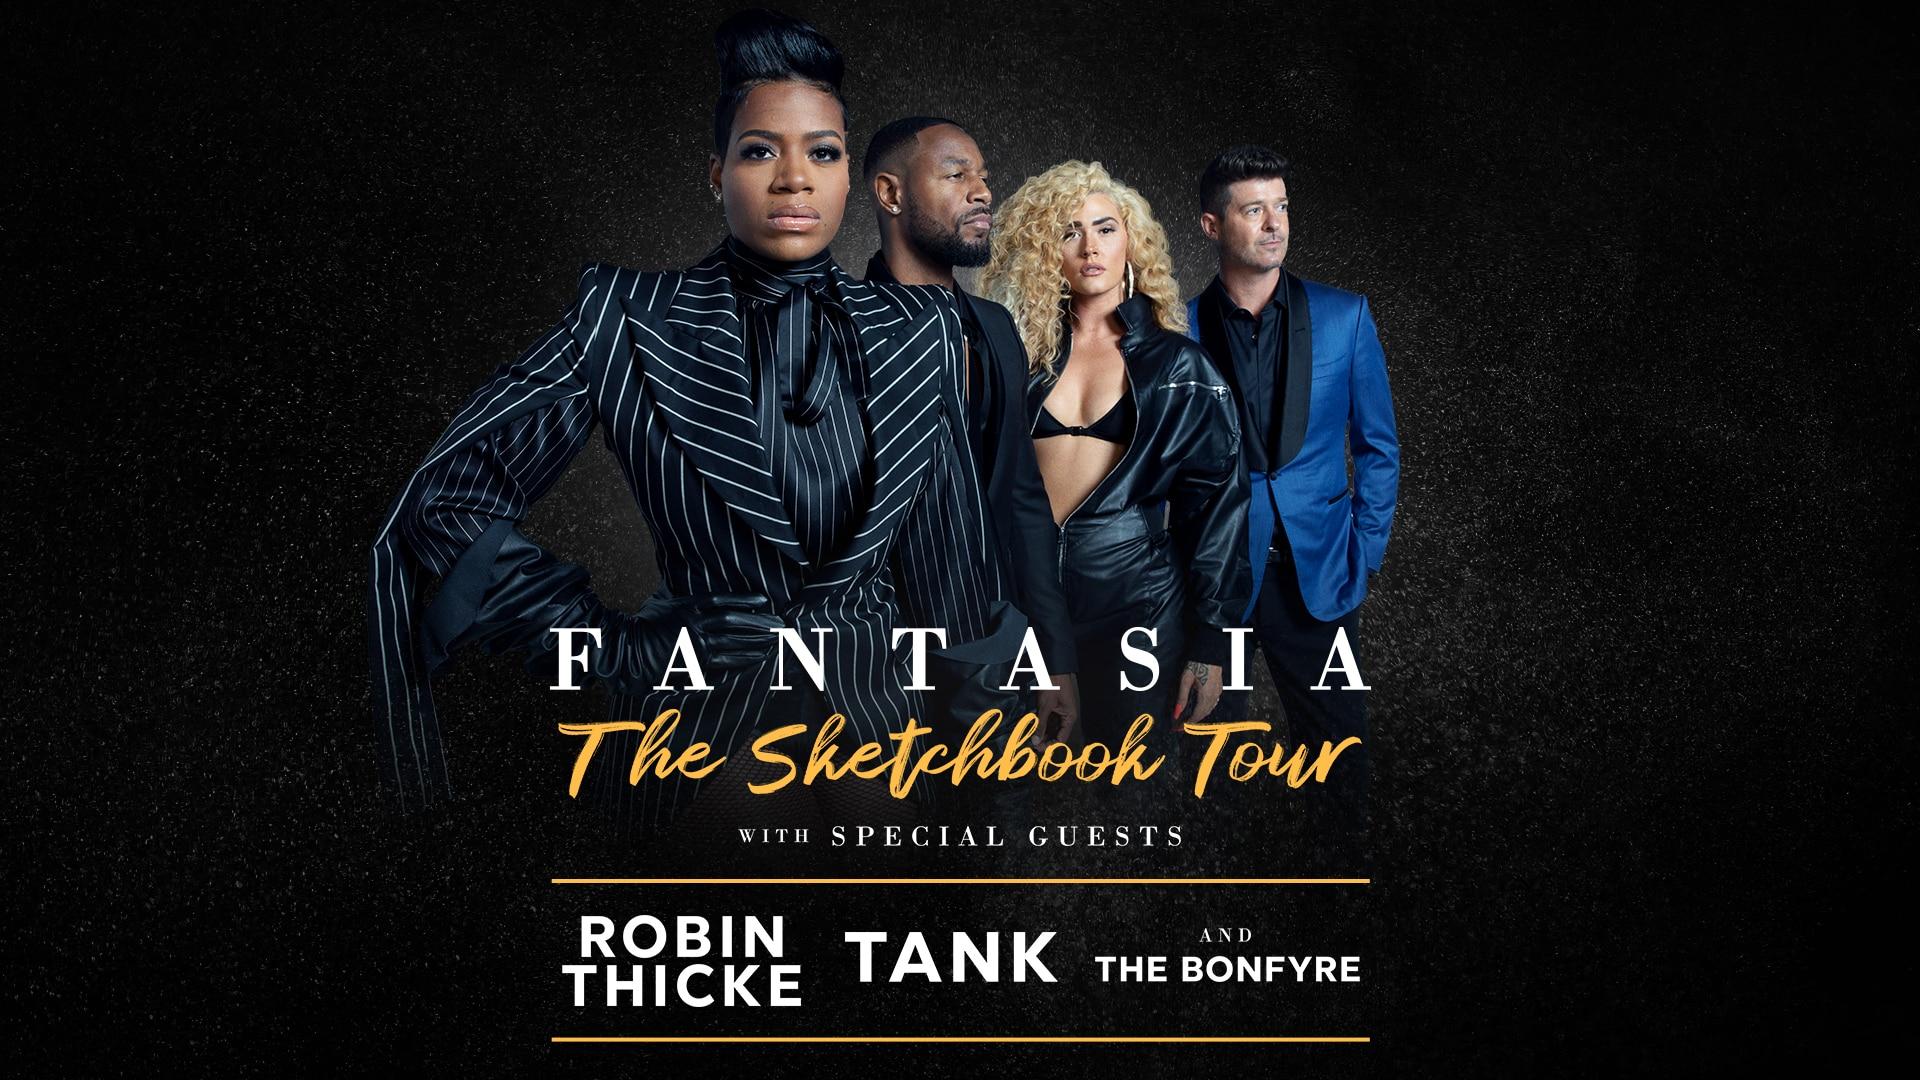 Fantasia Presents The Sketchbook Tour